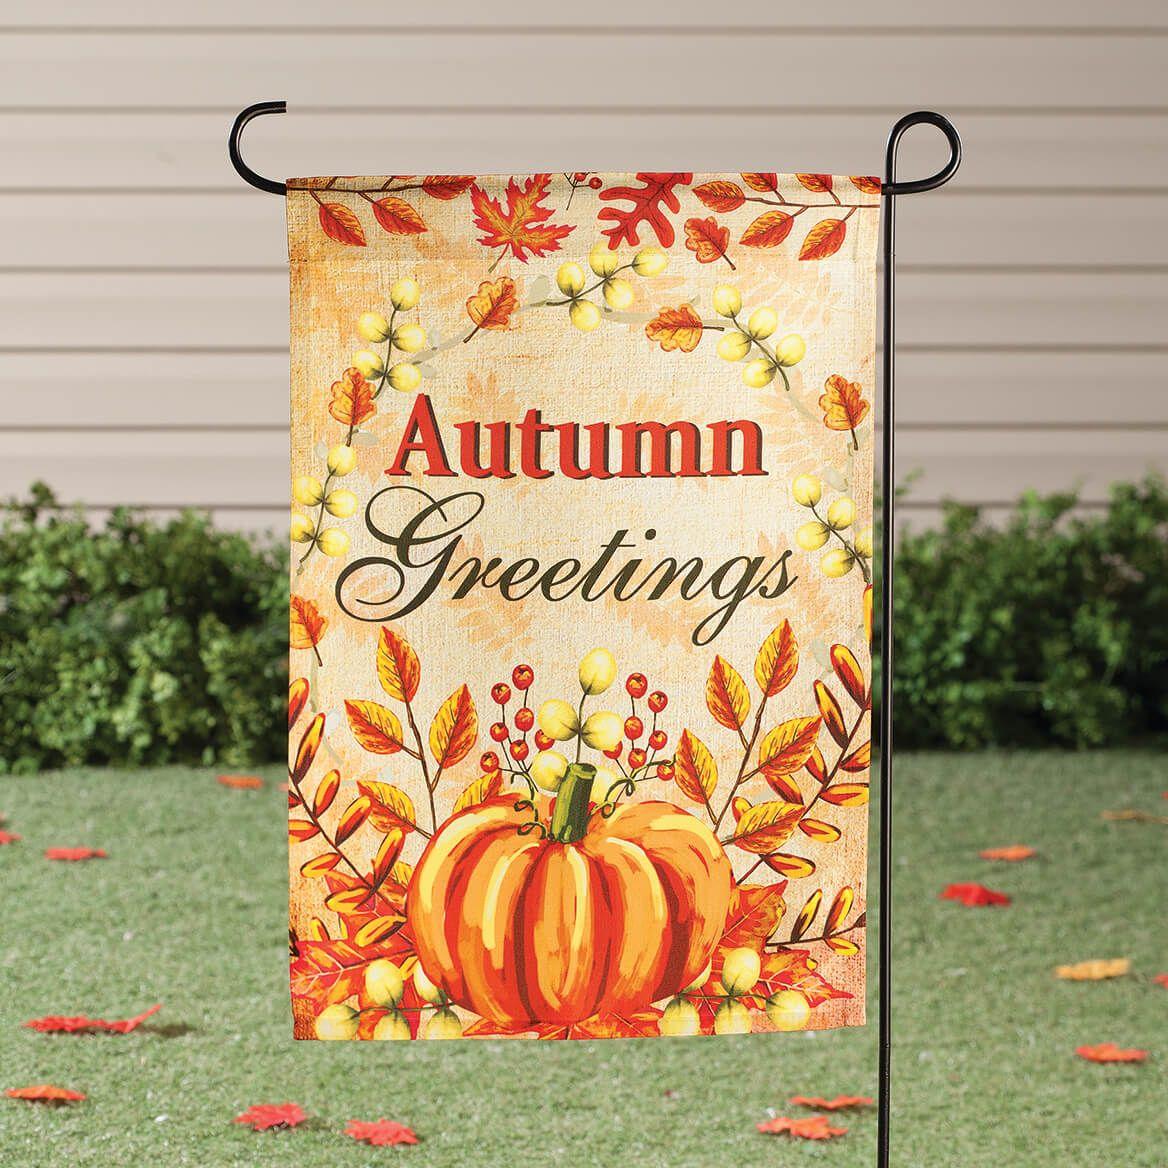 Autumn Greetings Garden Flag-364135